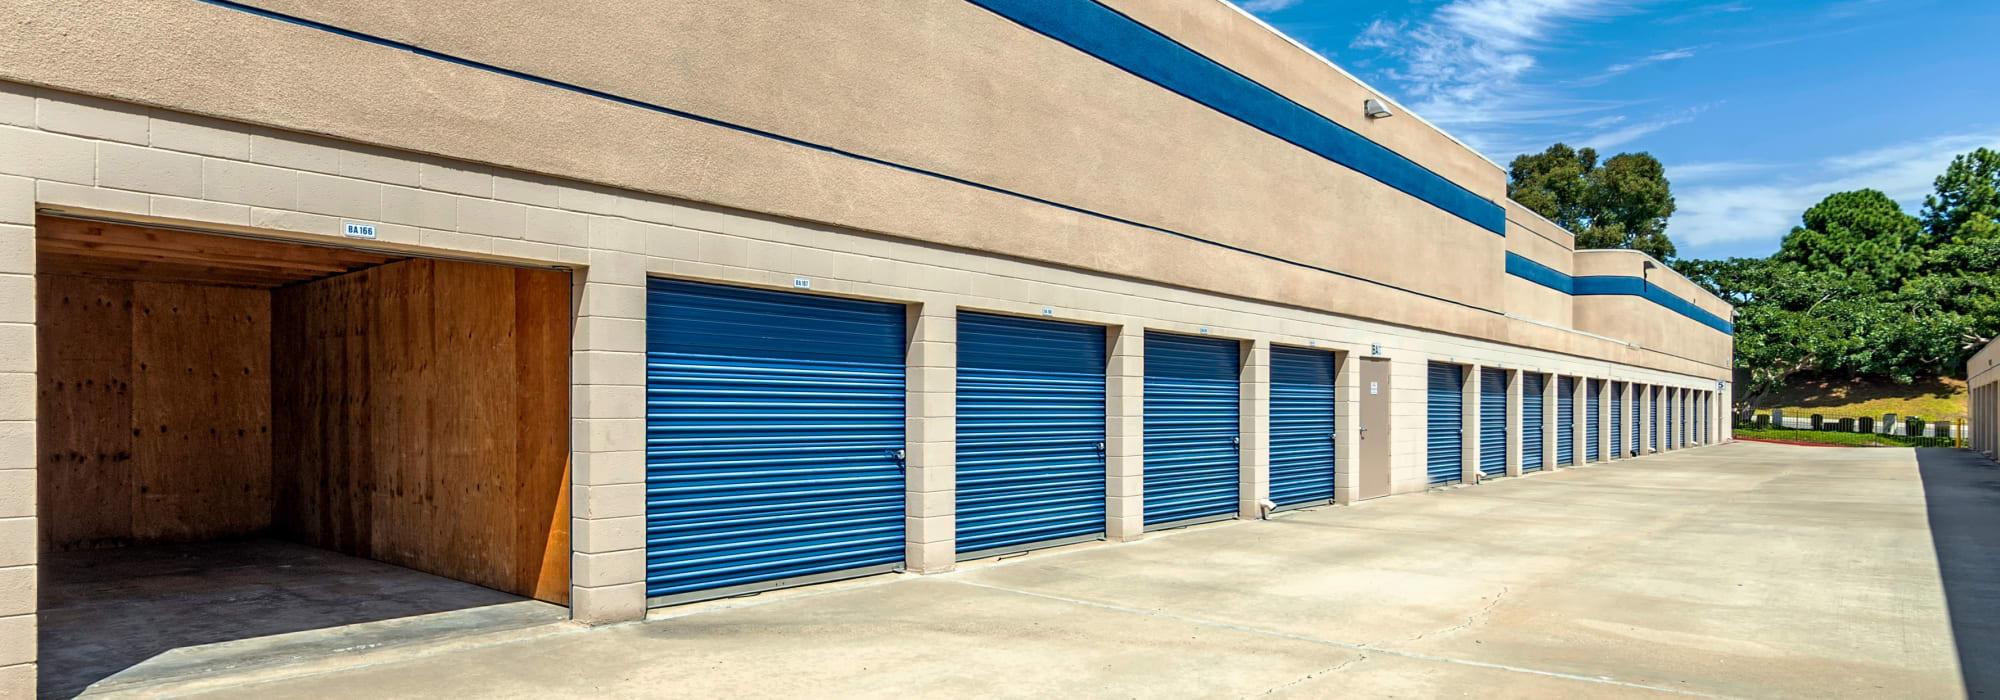 Outdoor units at Mira Mesa Self Storage in San Diego, California